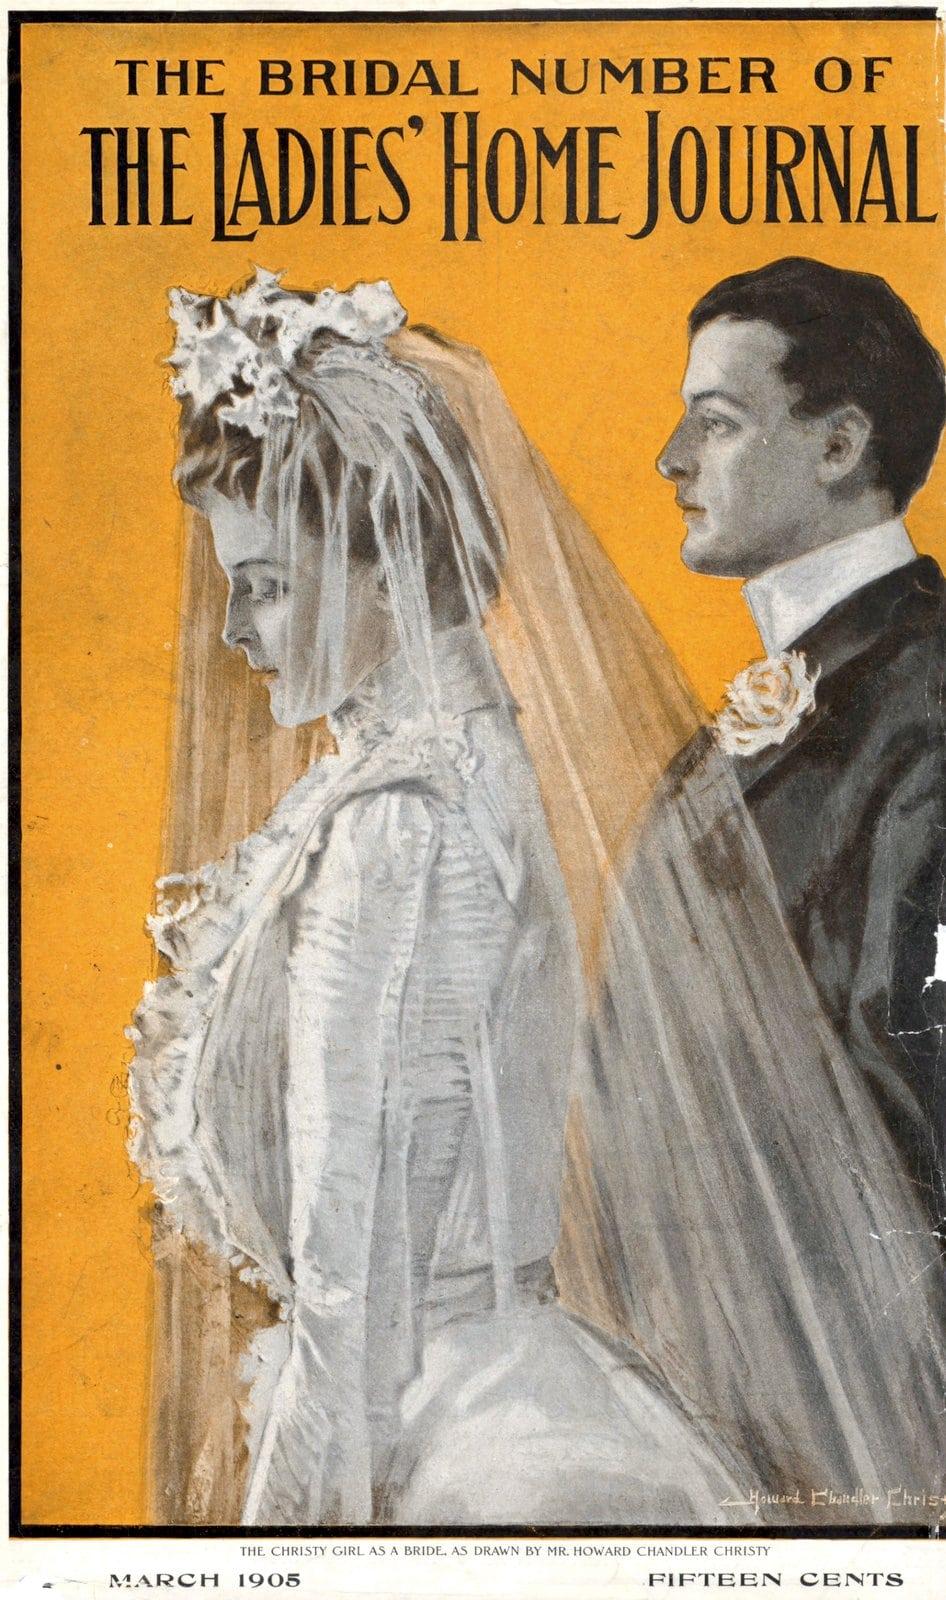 Vintage bride side profile view (1905)